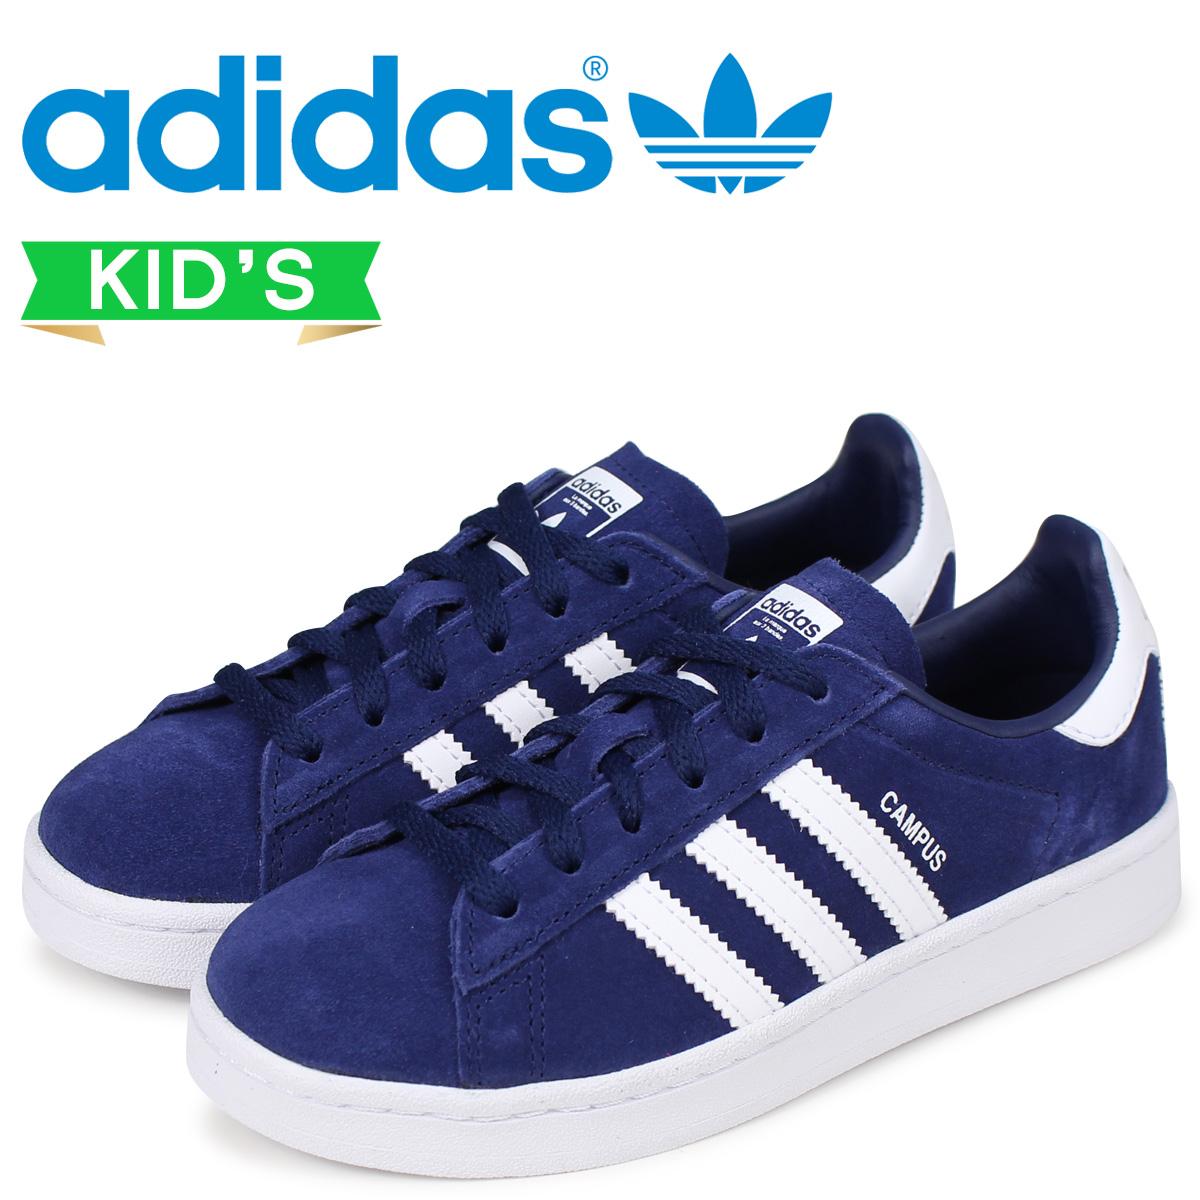 buy sale discount sale latest adidas Originals campus Adidas originals kids sneakers CAMPUS C BY9593 blue